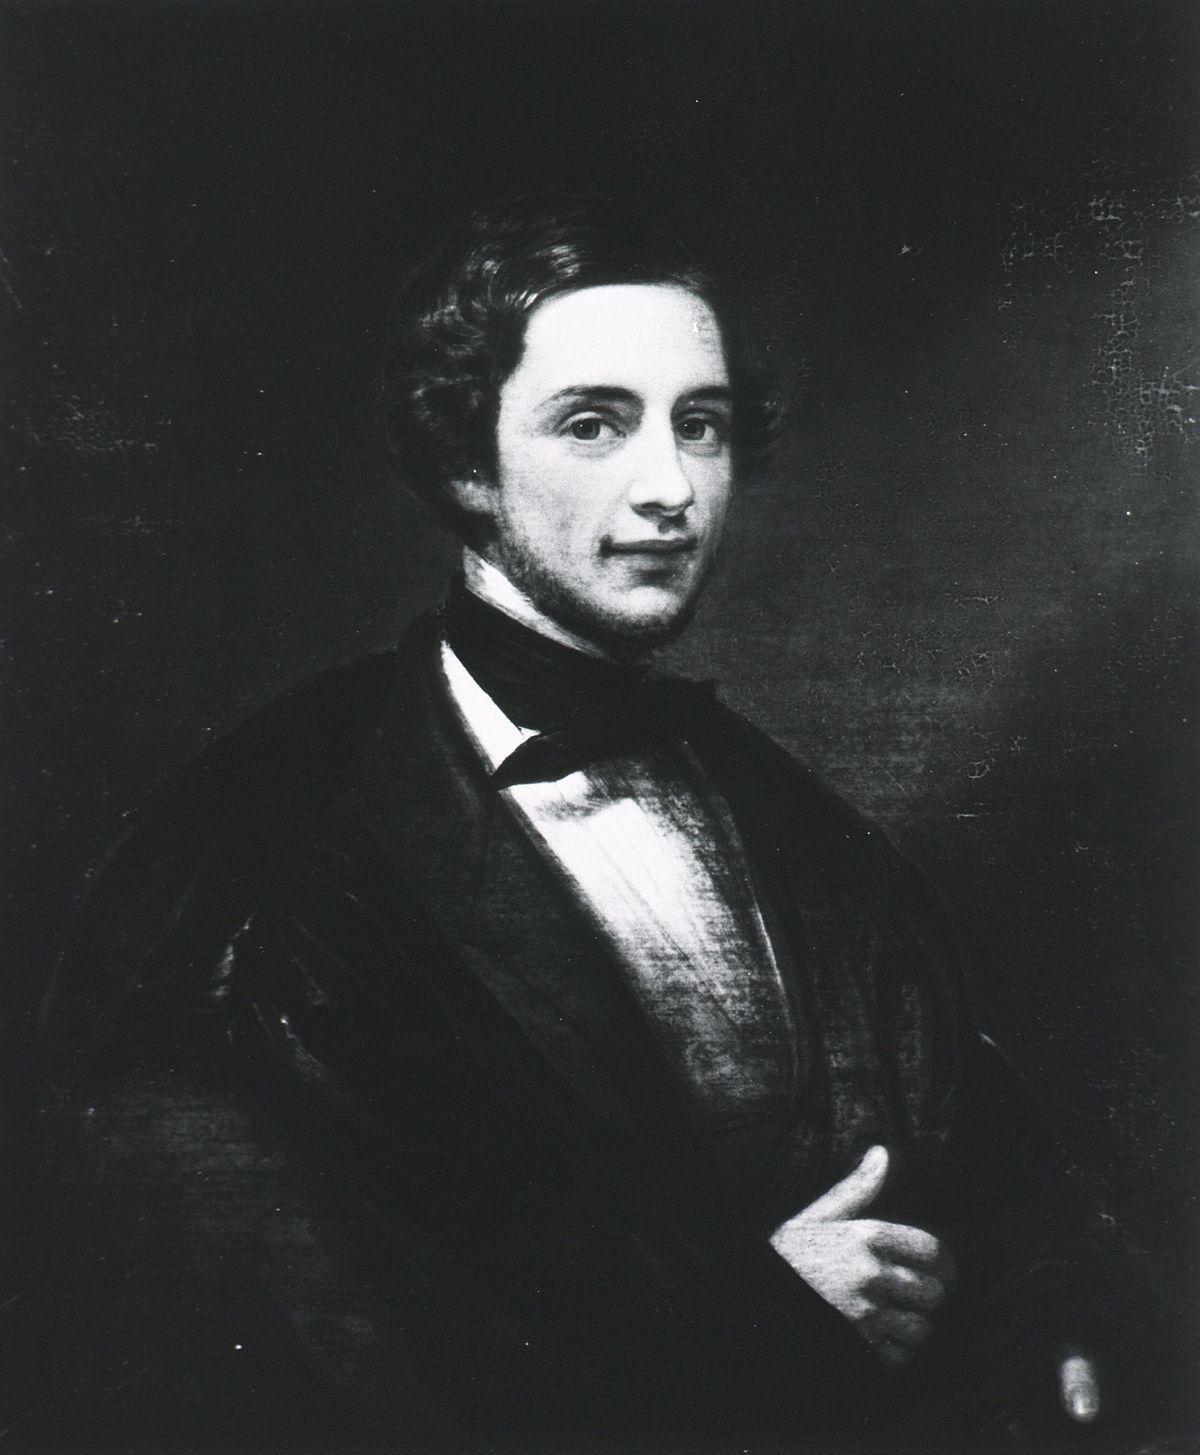 Edwin_Smith_(1822-1906).JPG